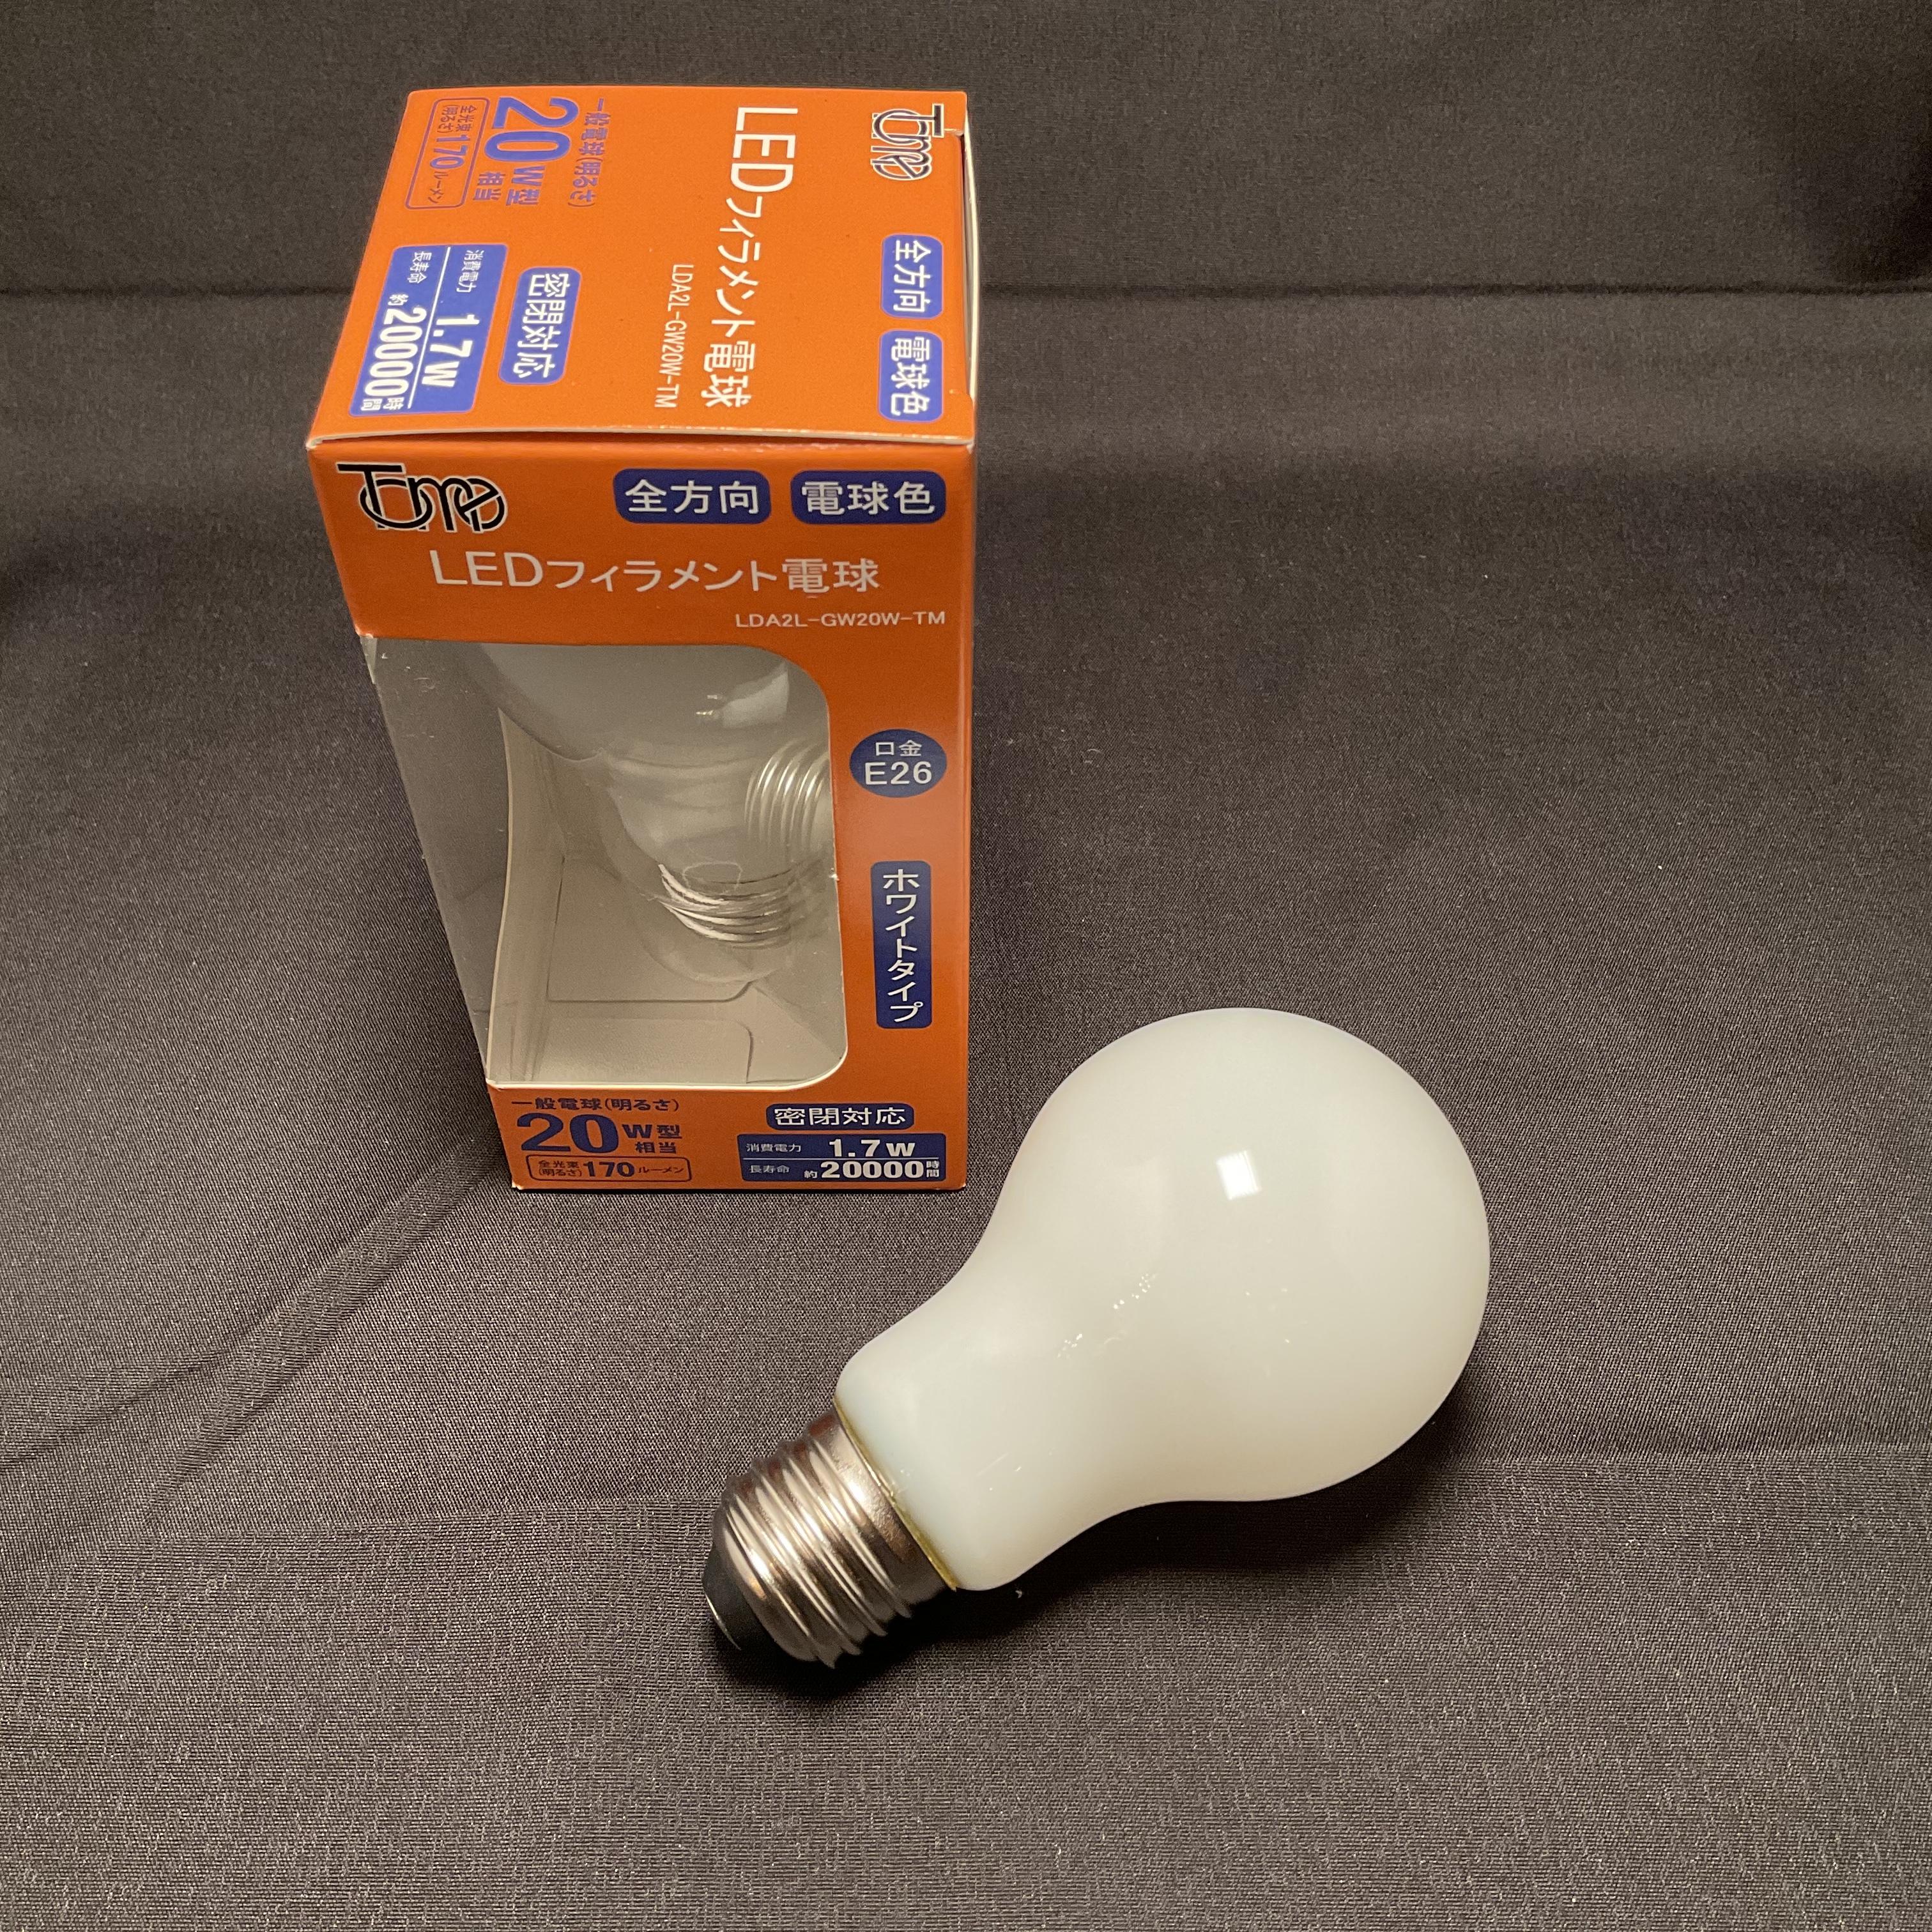 LED電球 E26 20W相当 フィラメント型 ホワイトタイプ